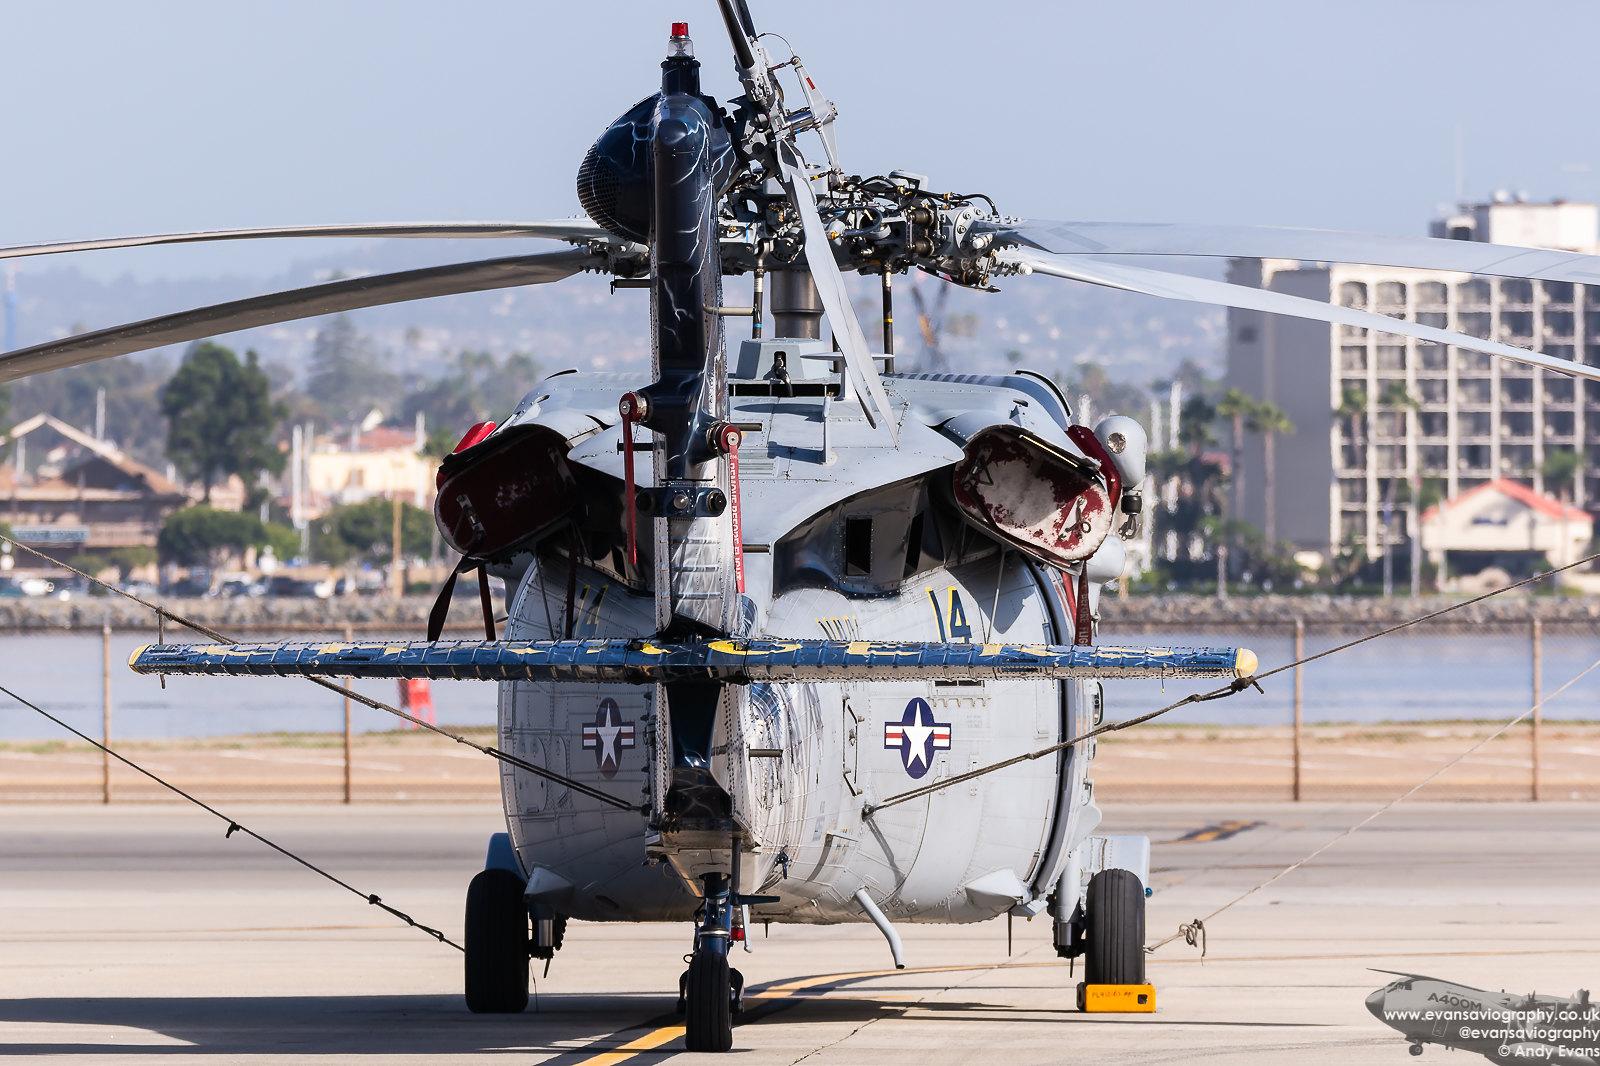 168553 MH-60S HSC-14